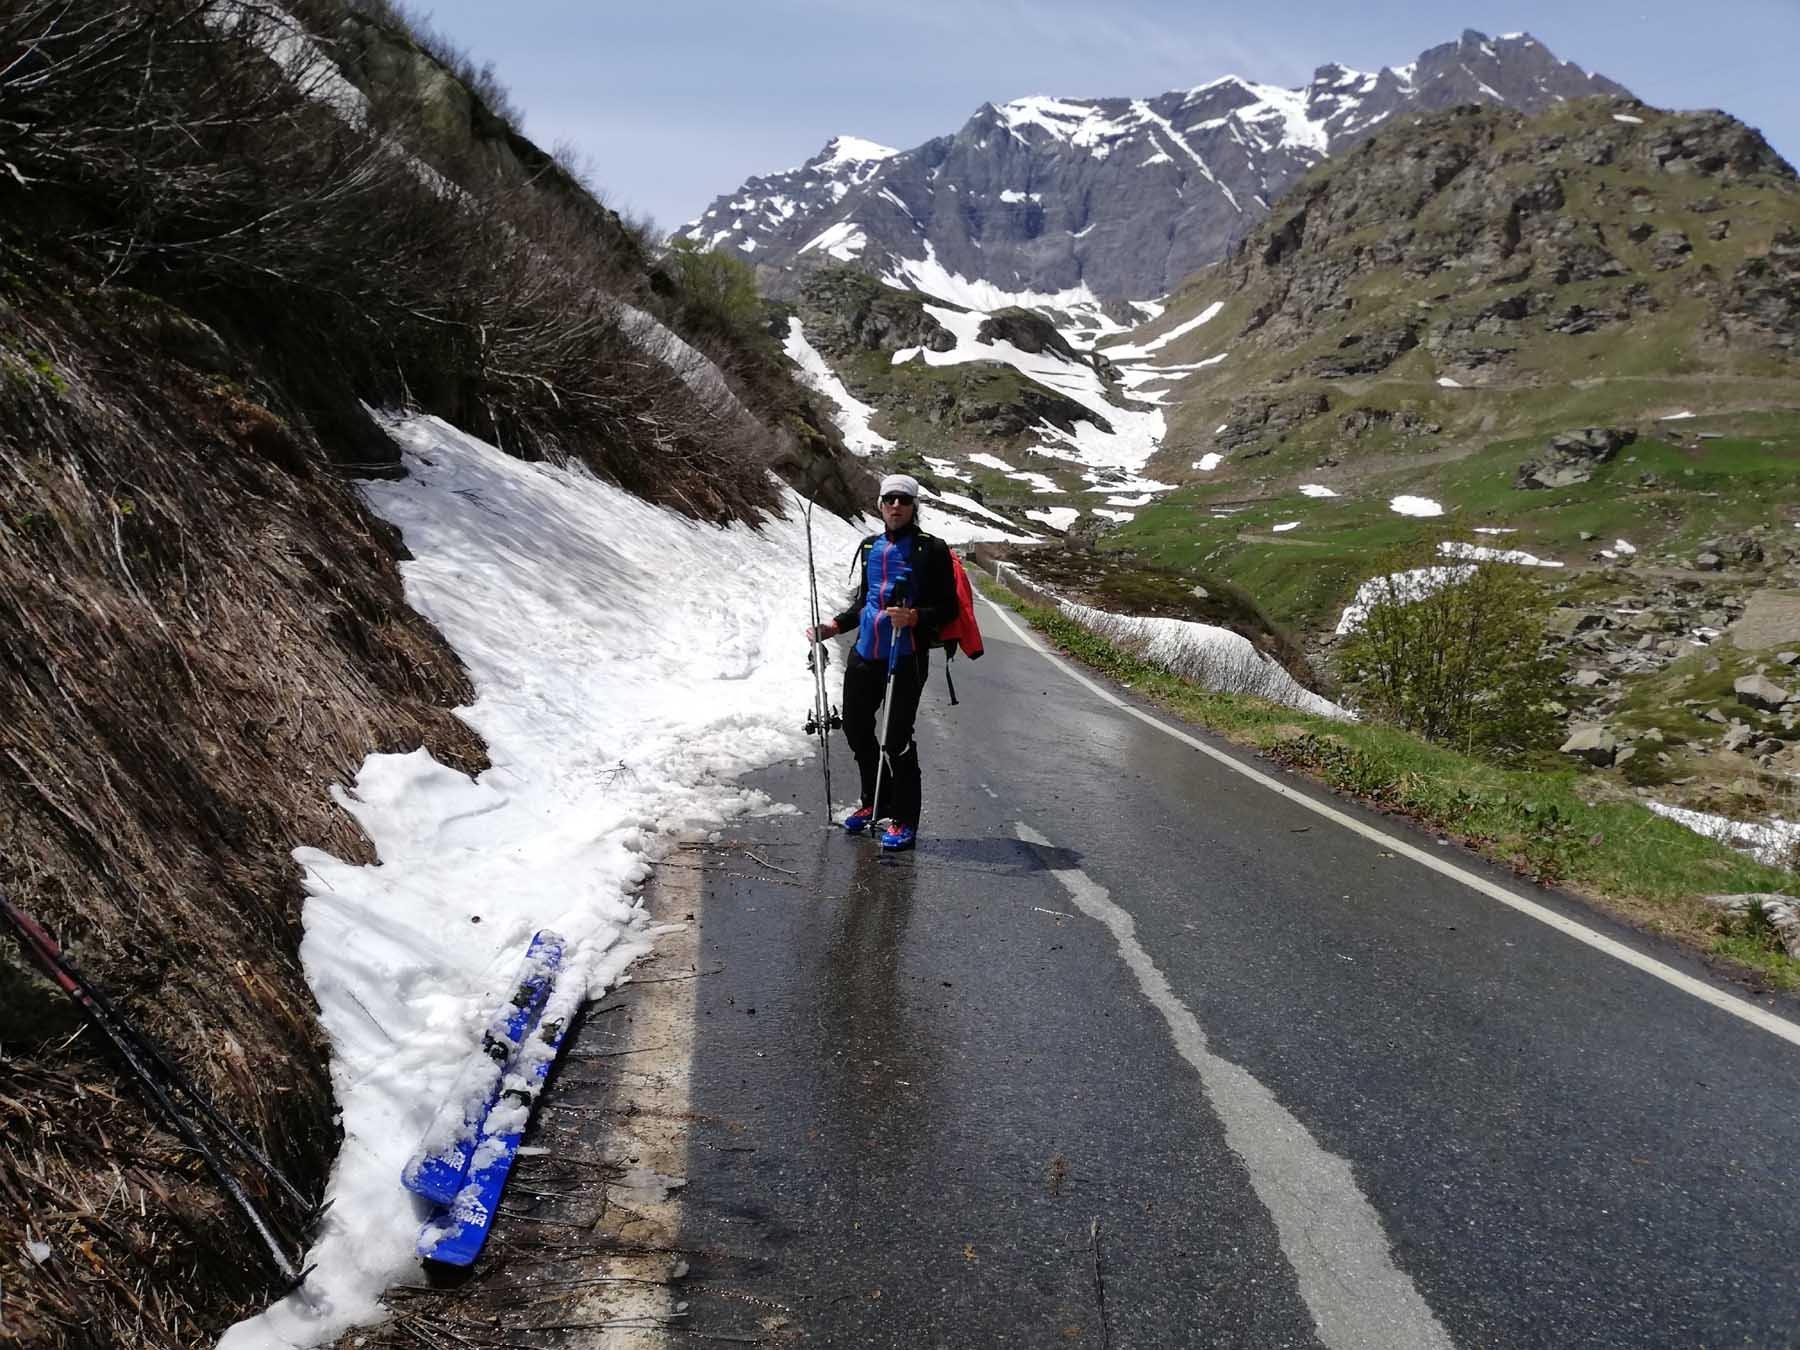 Si arriva ancora sopra all'Alpe Brangie